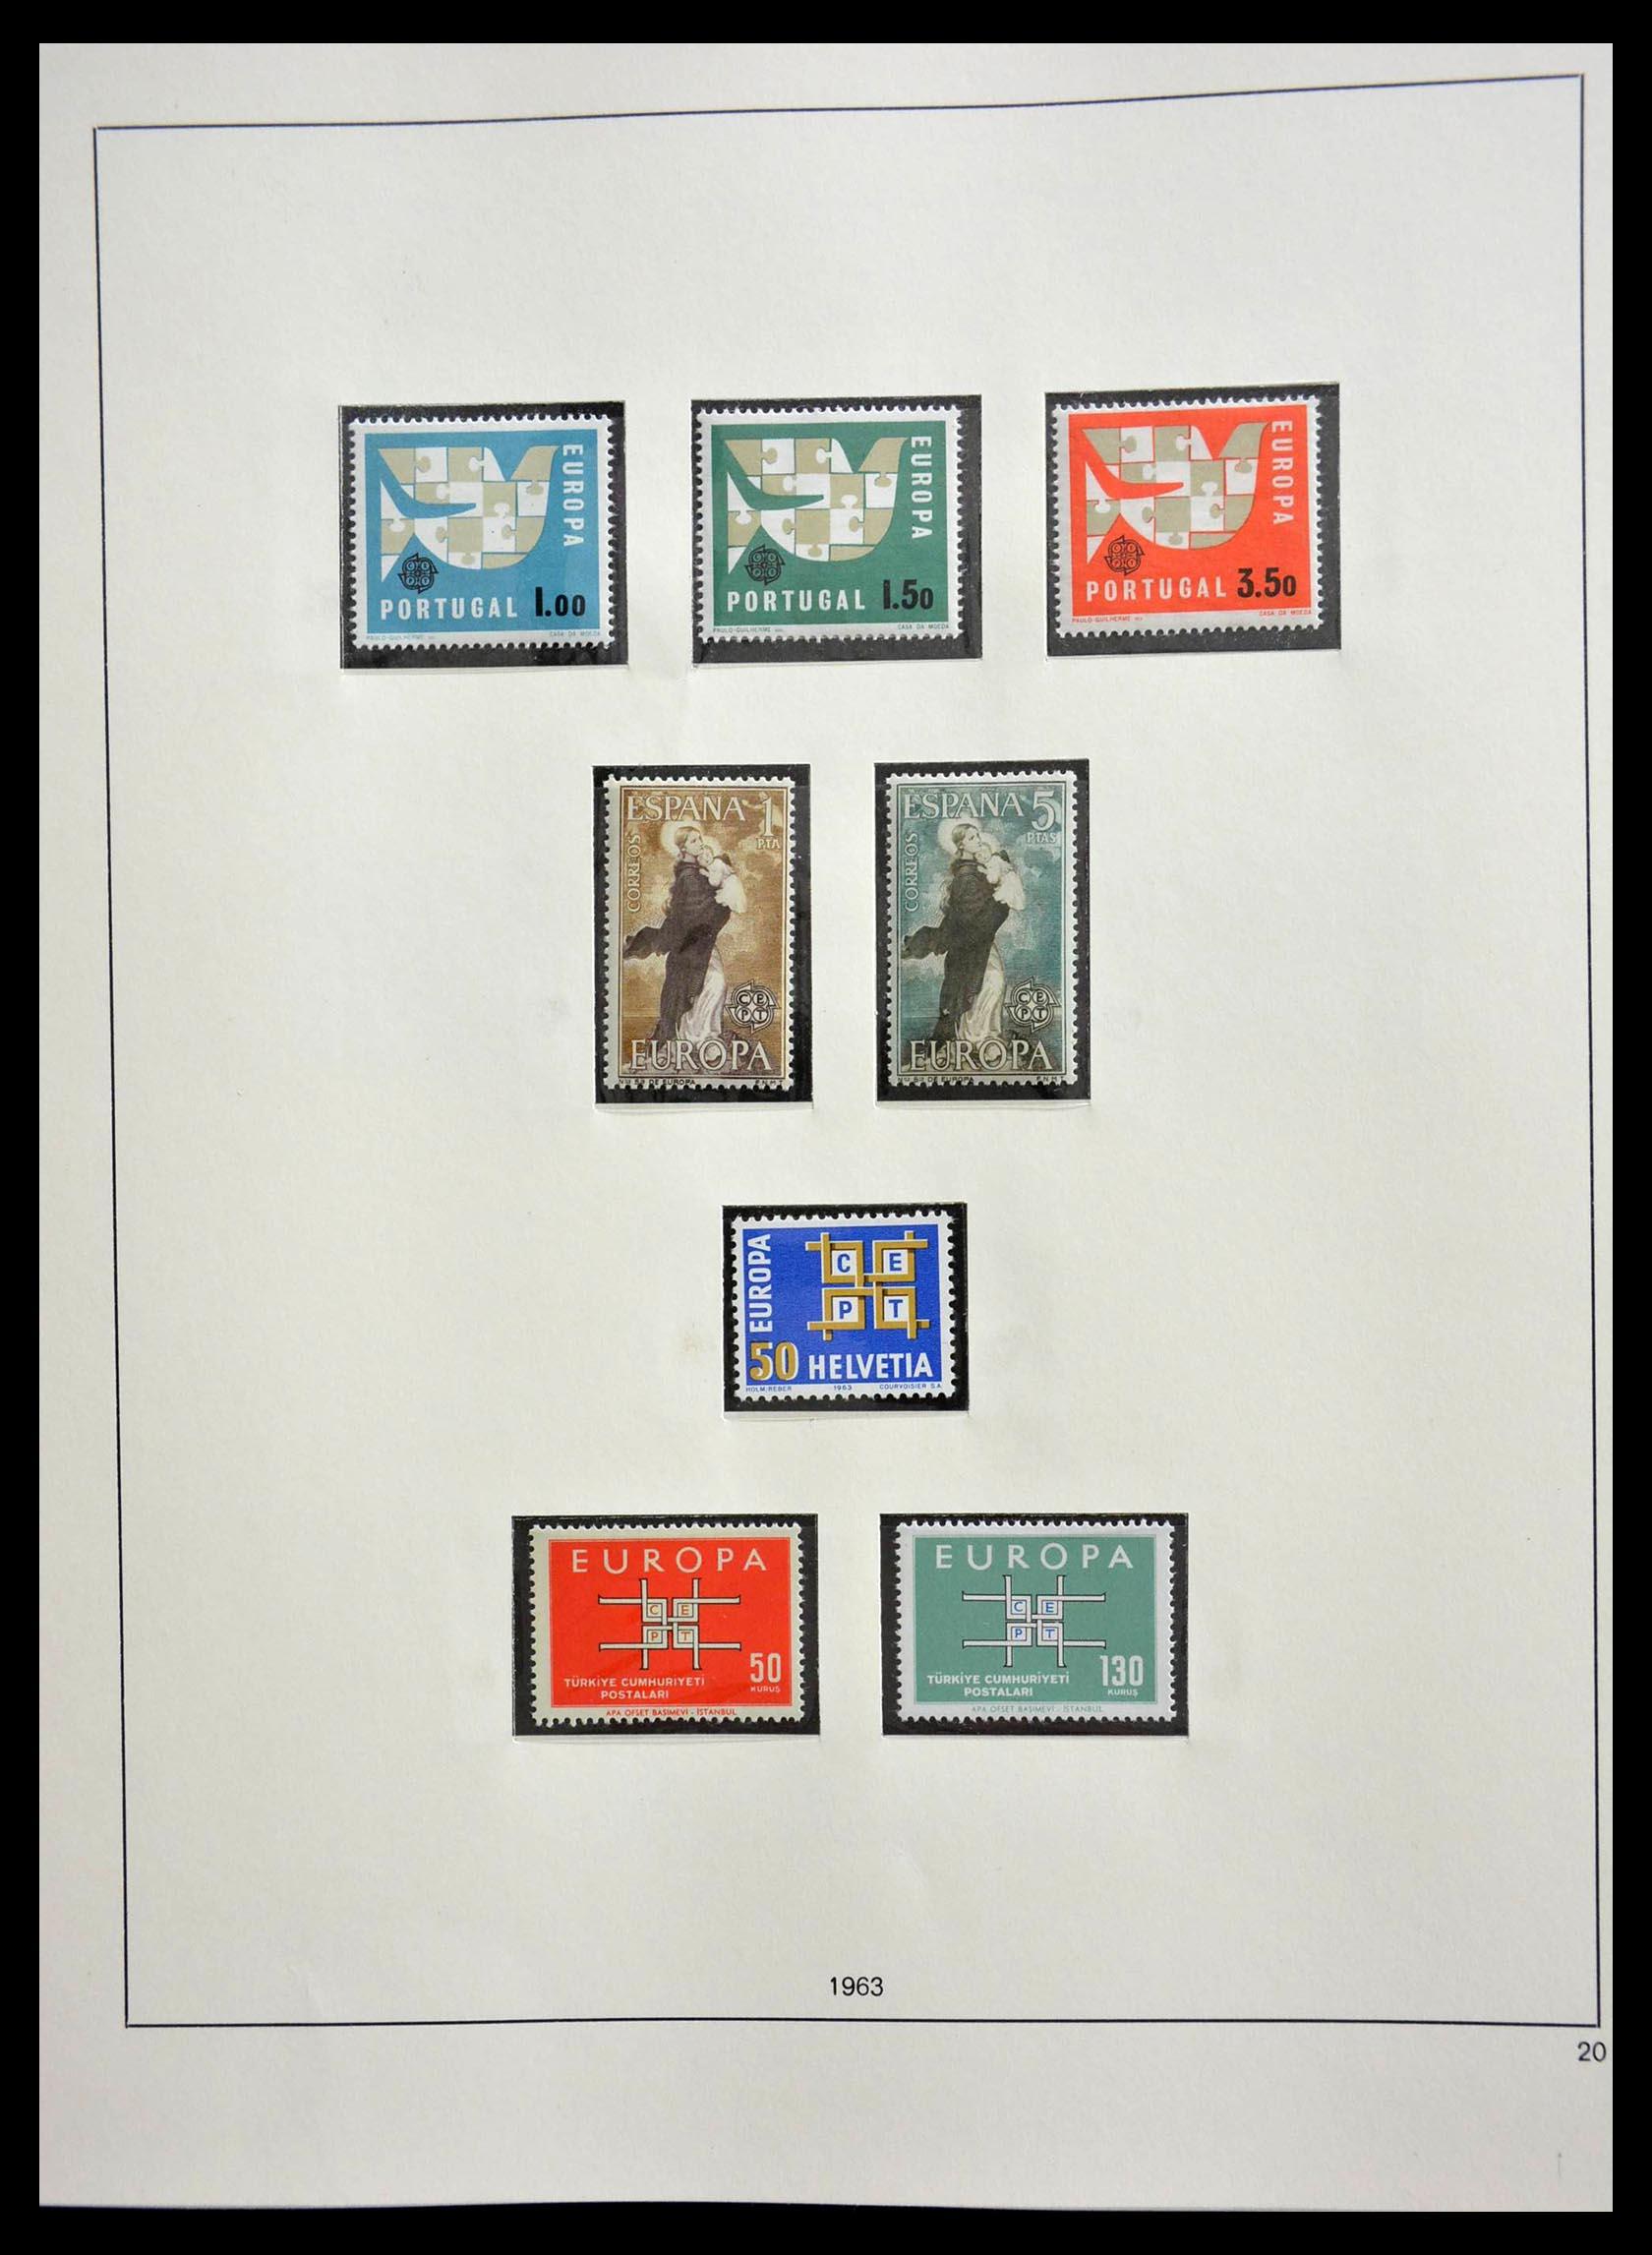 28637 013 - 28637 Europe Cept 1956-2000.